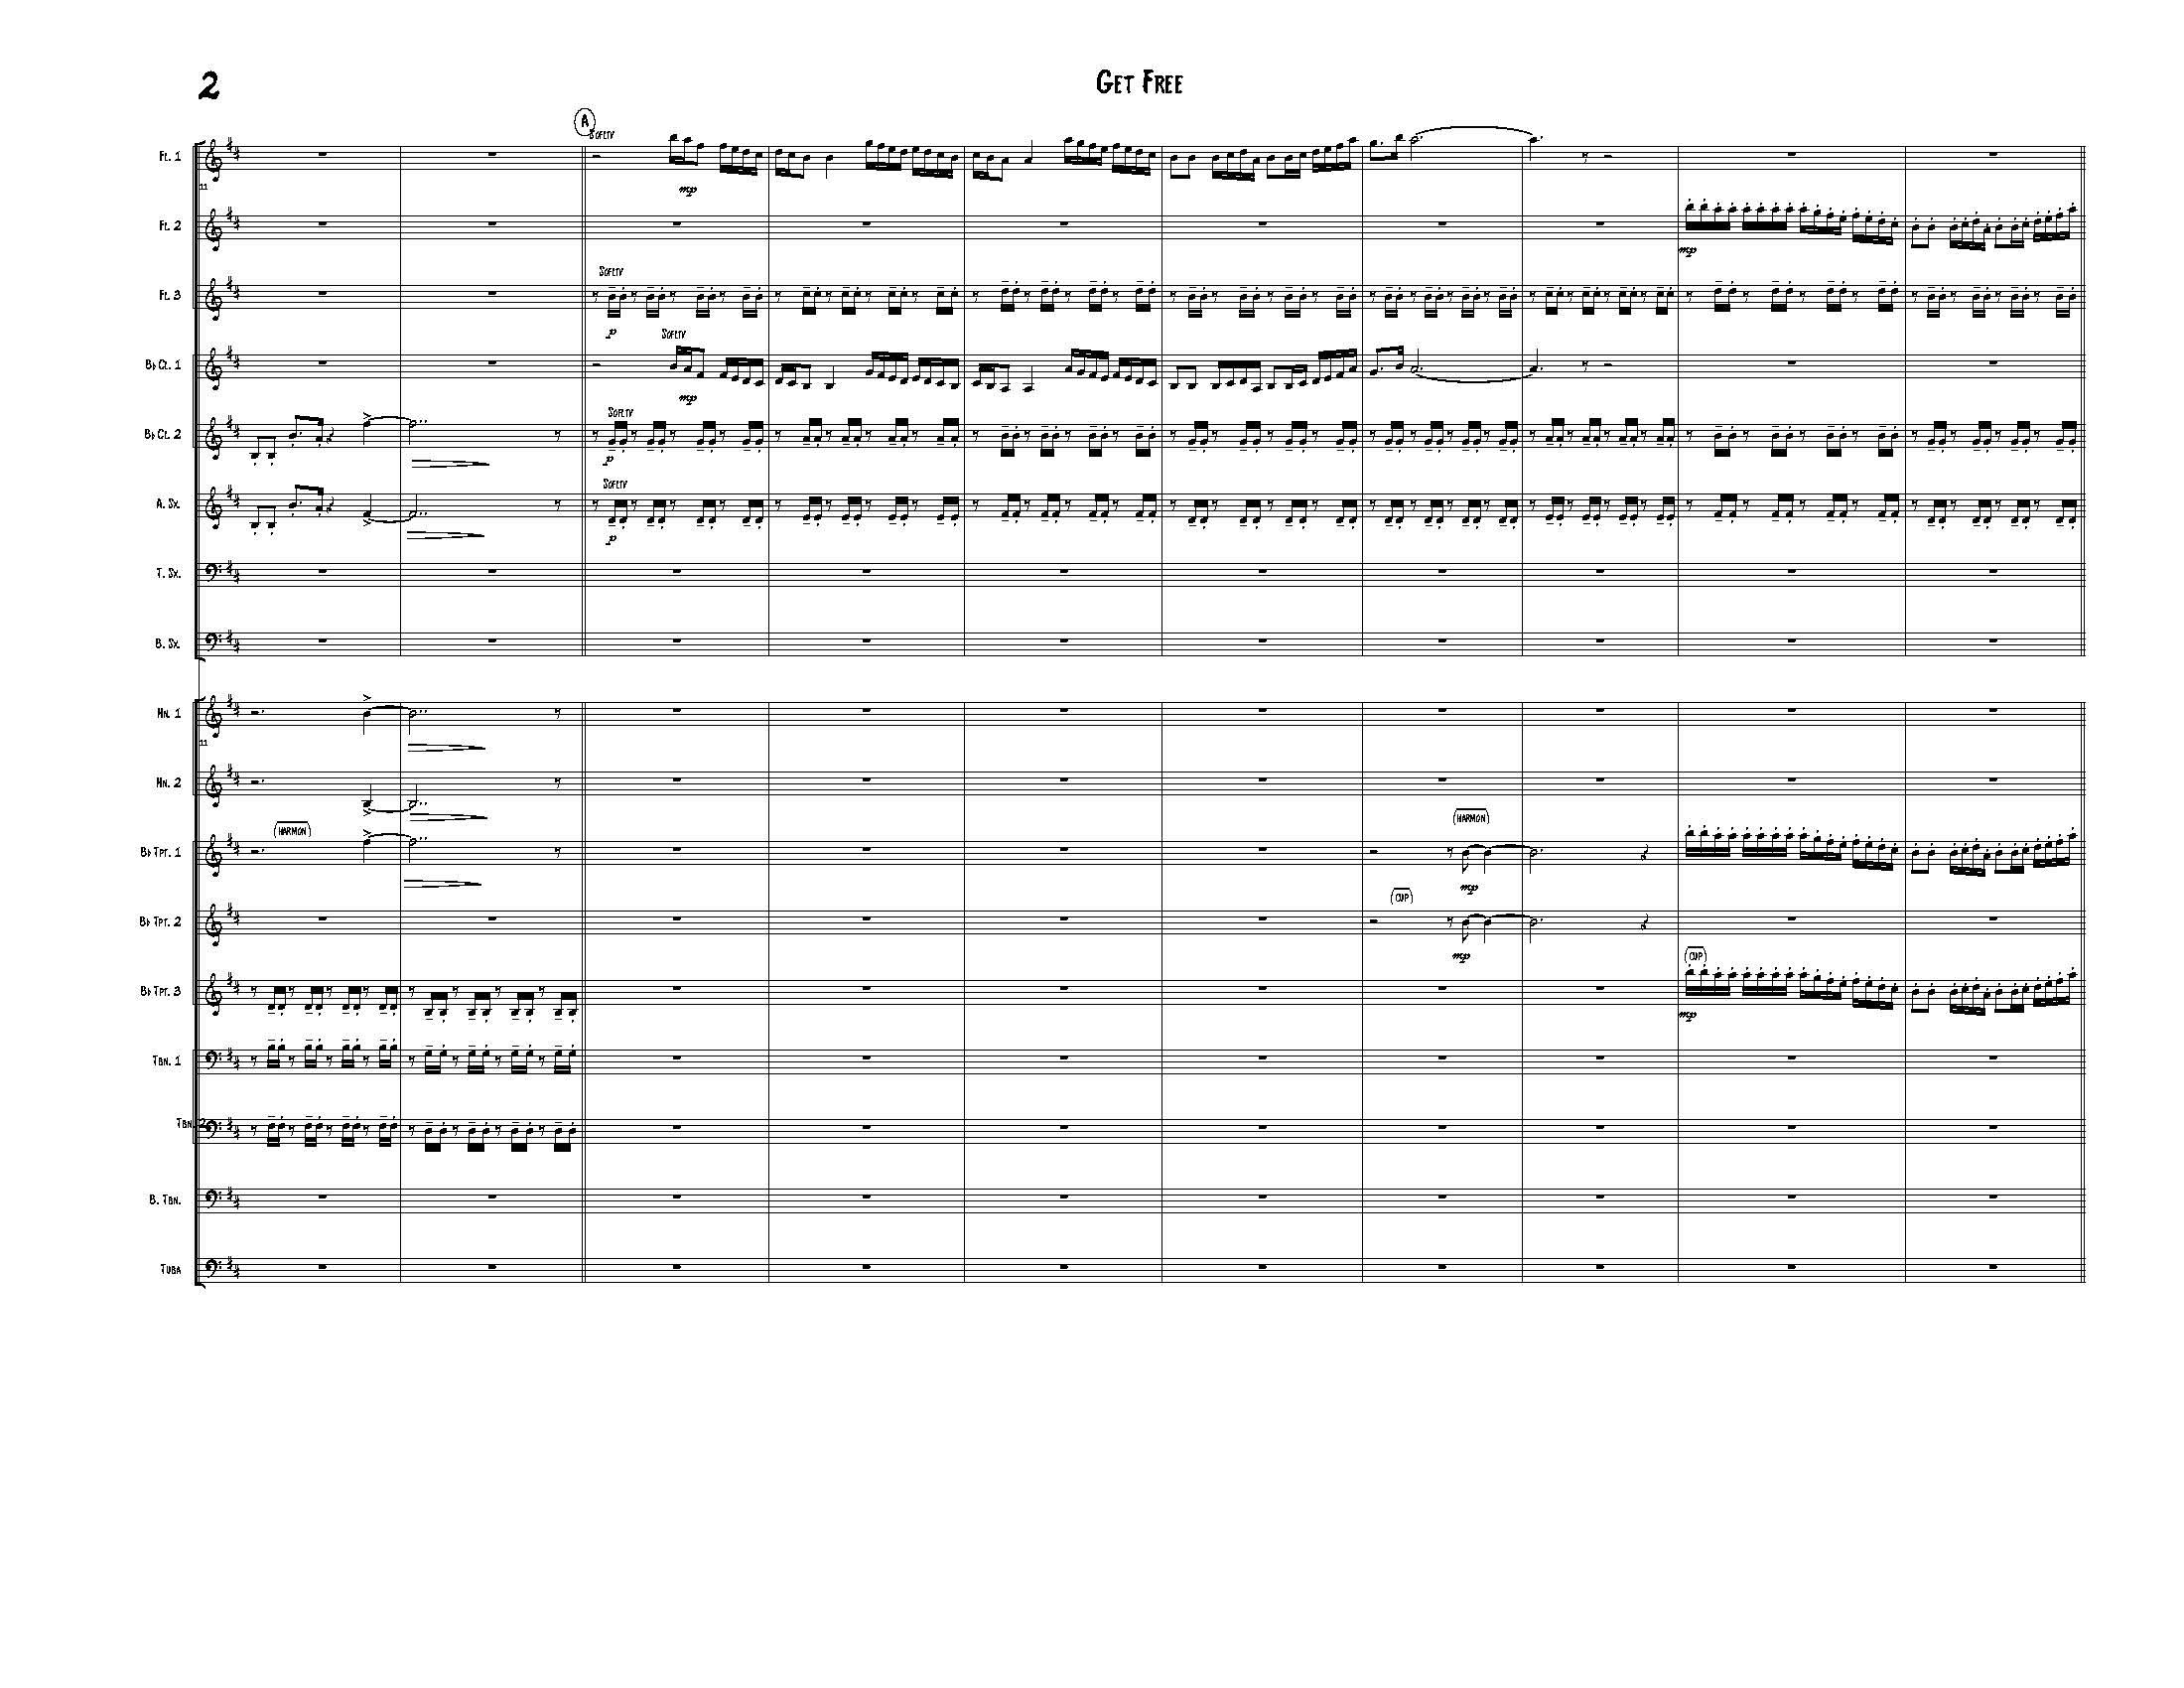 Get Free BKLYN 1834 Score_Page_02.jpg